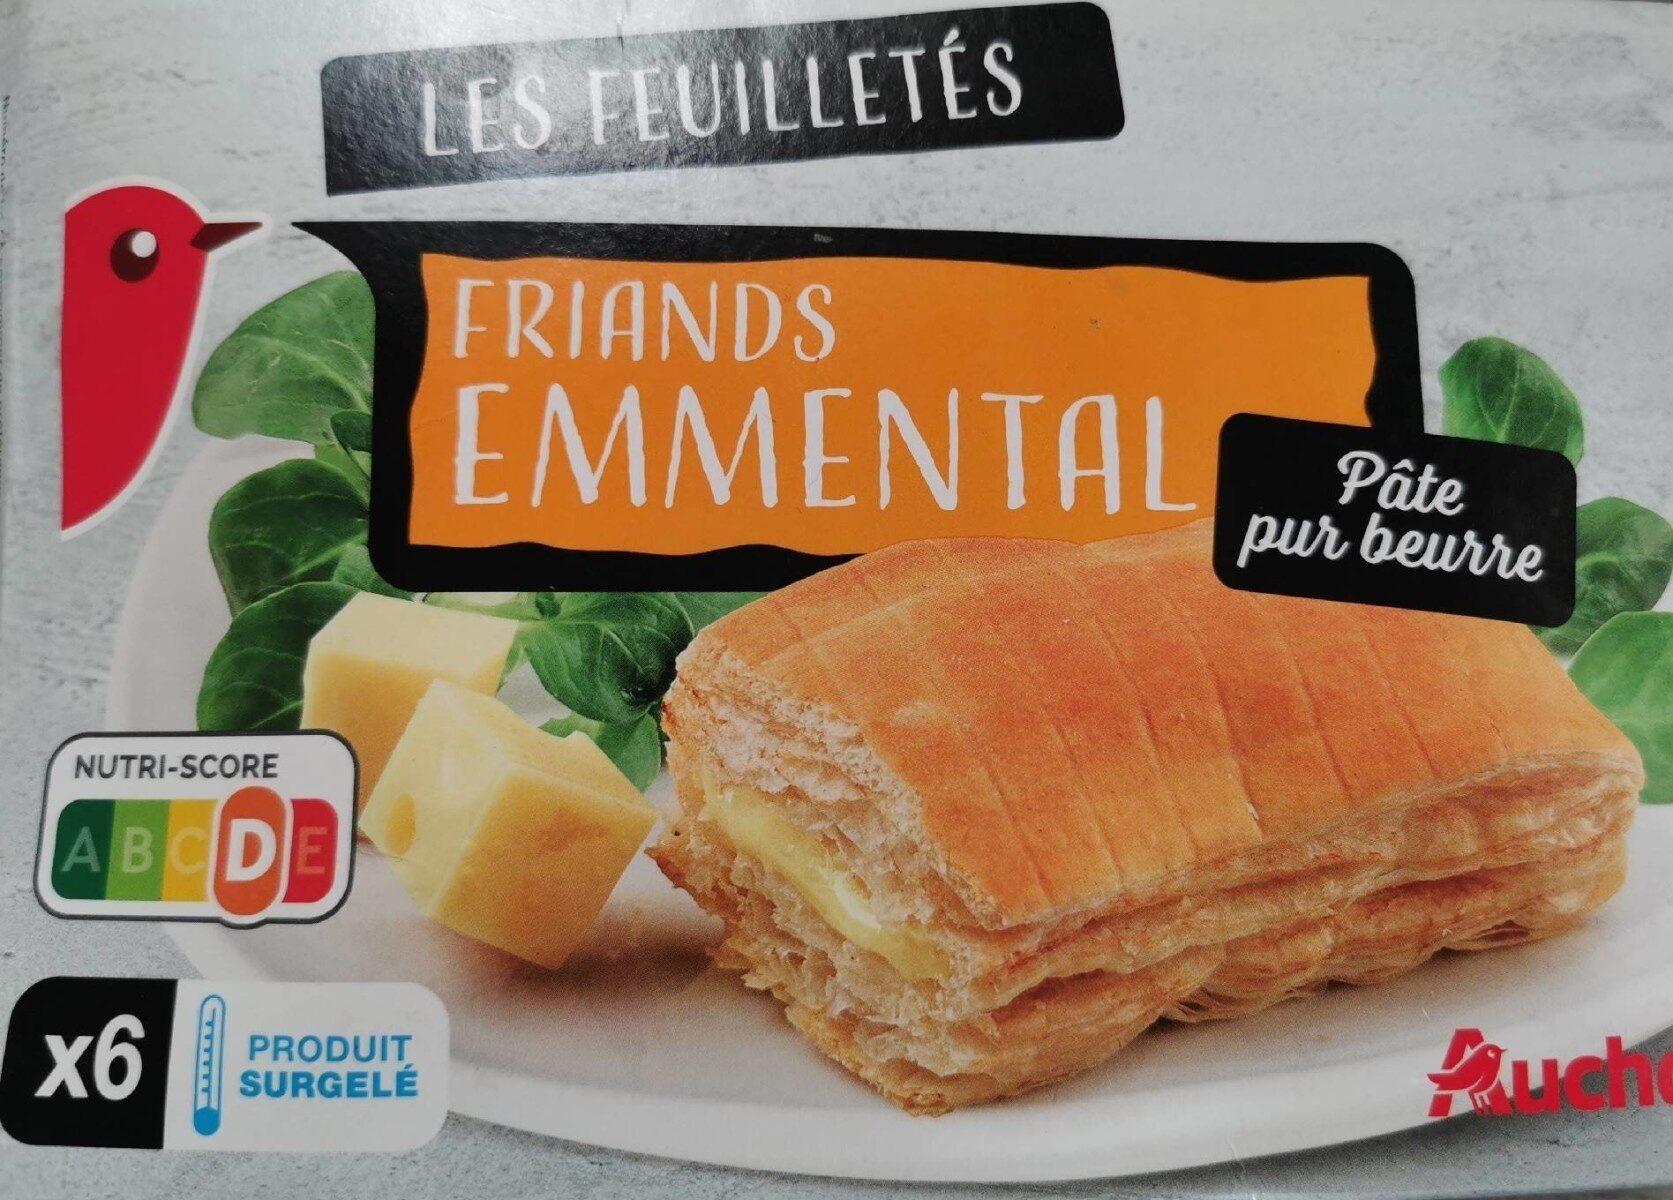 Friand emmental - Product - fr